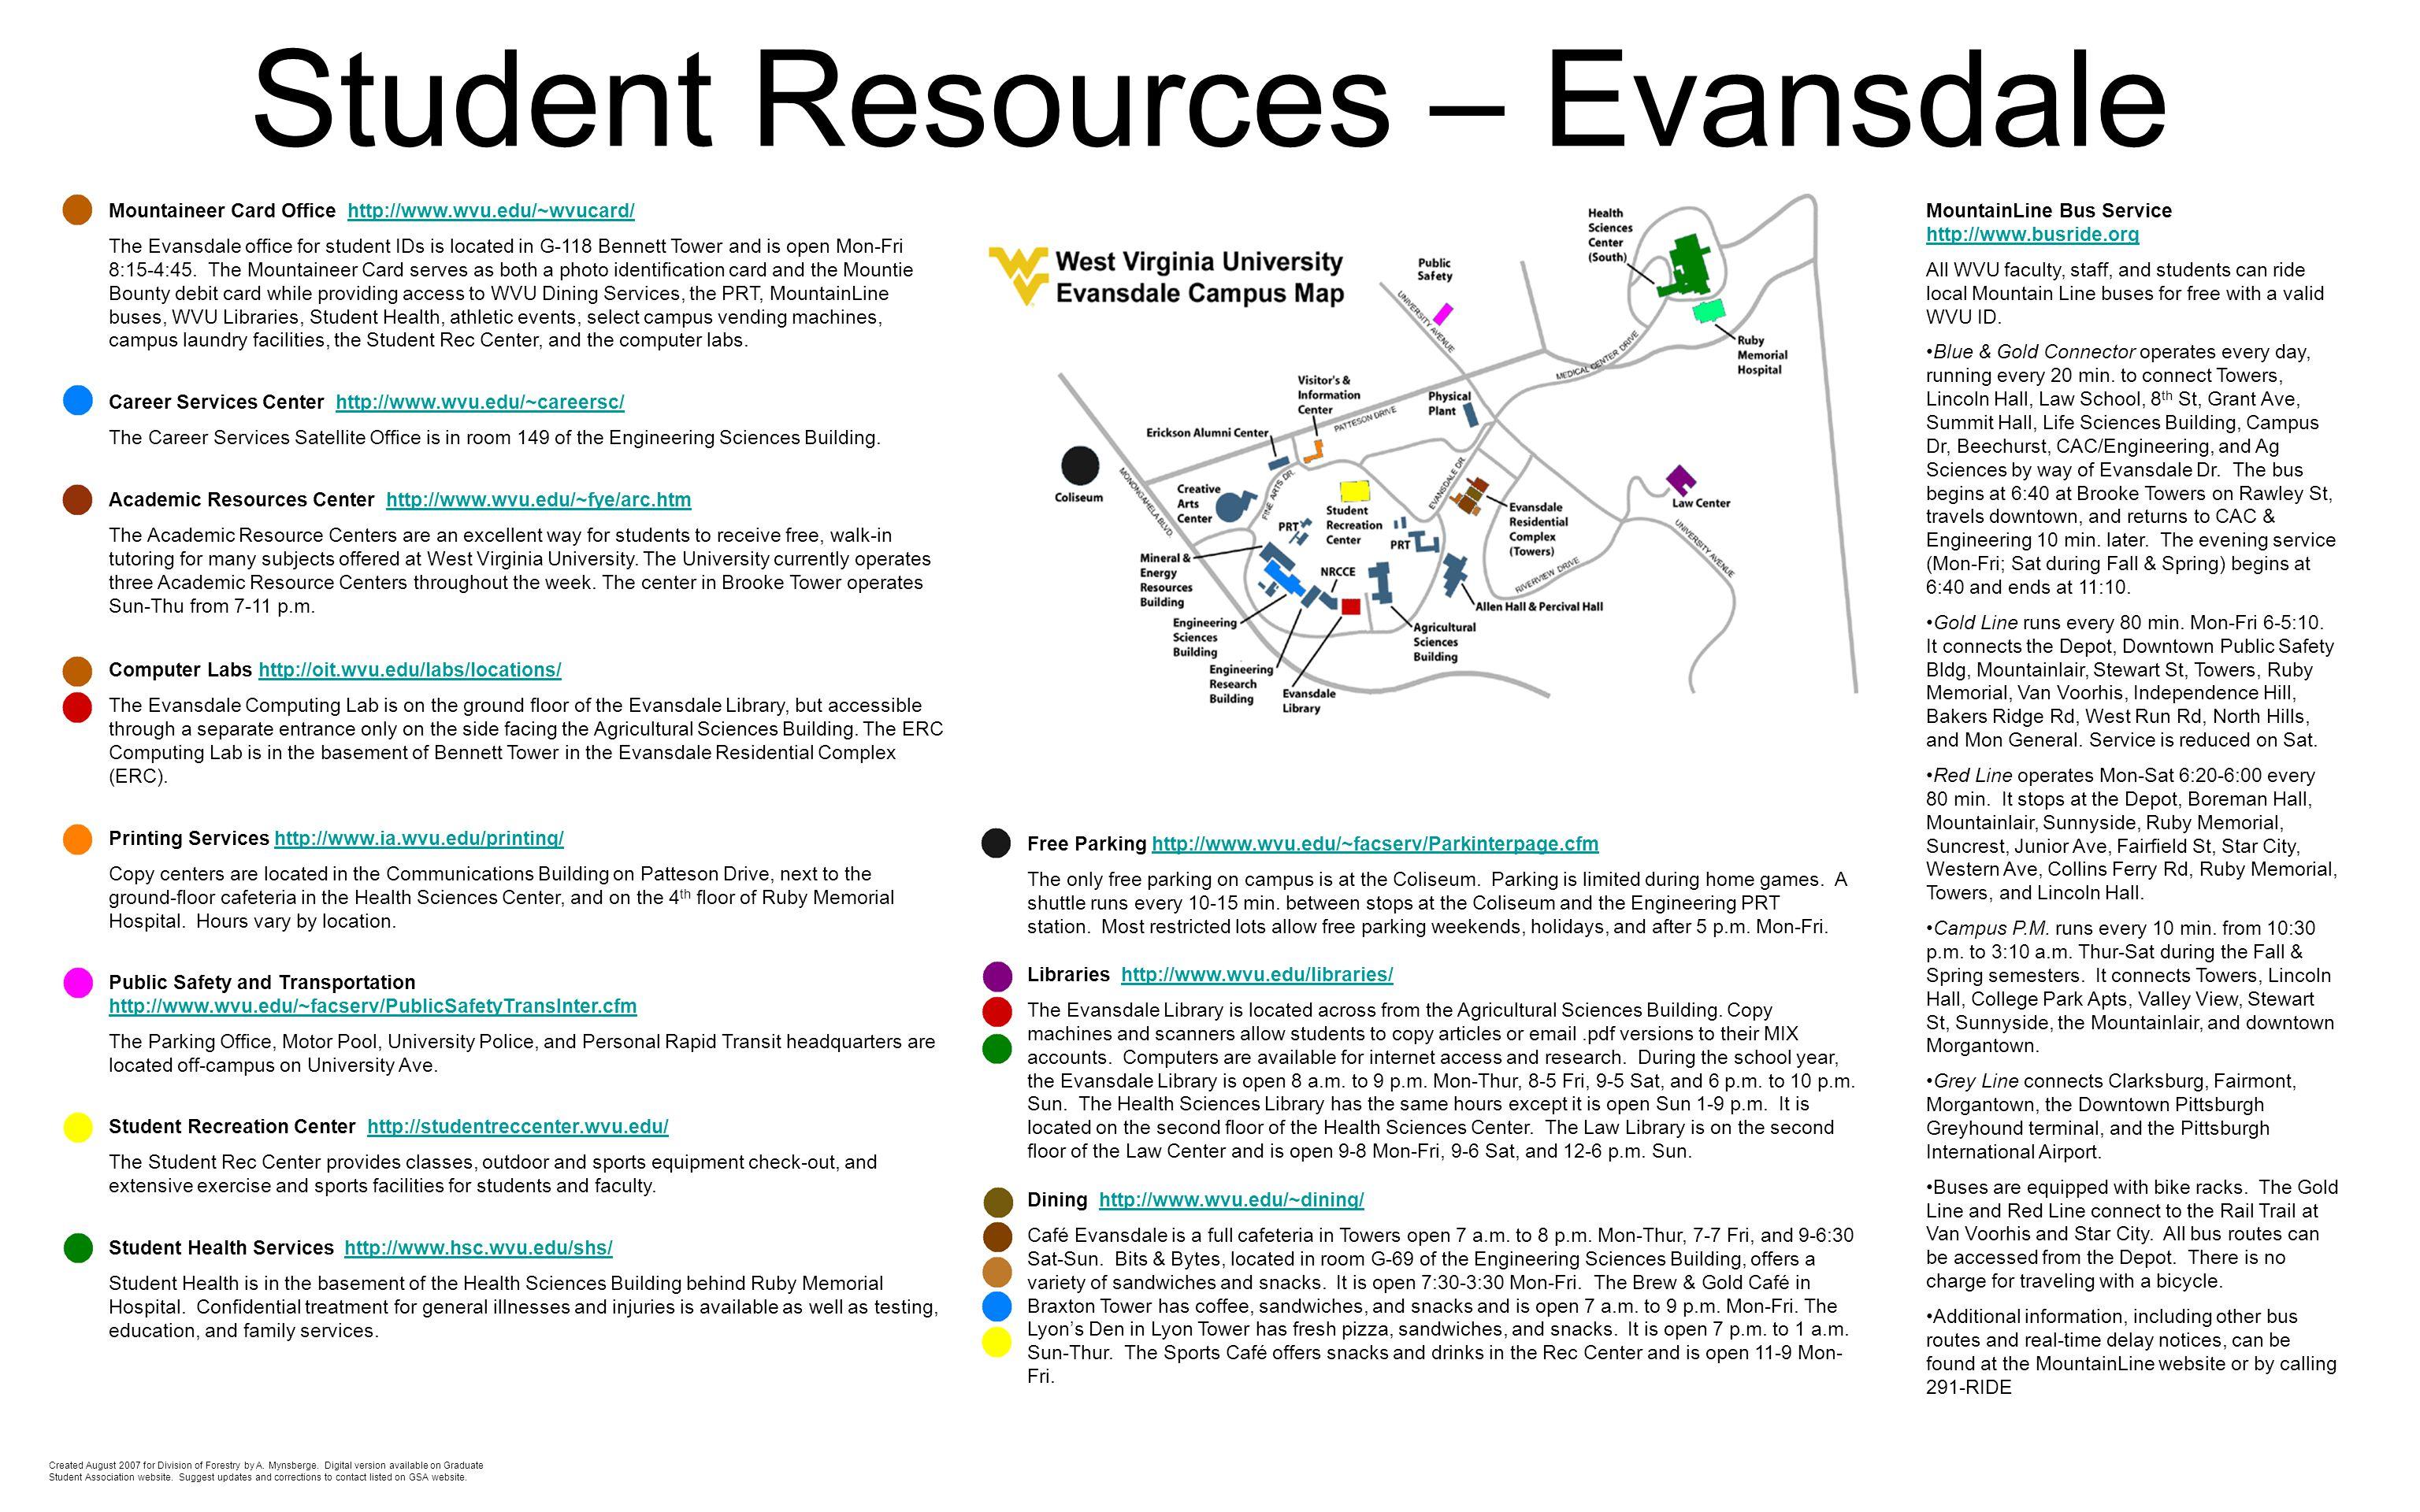 Student Resources – Evansdale Mountaineer Card Office http://www.wvu.edu/~wvucard/http://www.wvu.edu/~wvucard/ The Evansdale office for student IDs is located in G-118 Bennett Tower and is open Mon-Fri 8:15-4:45.